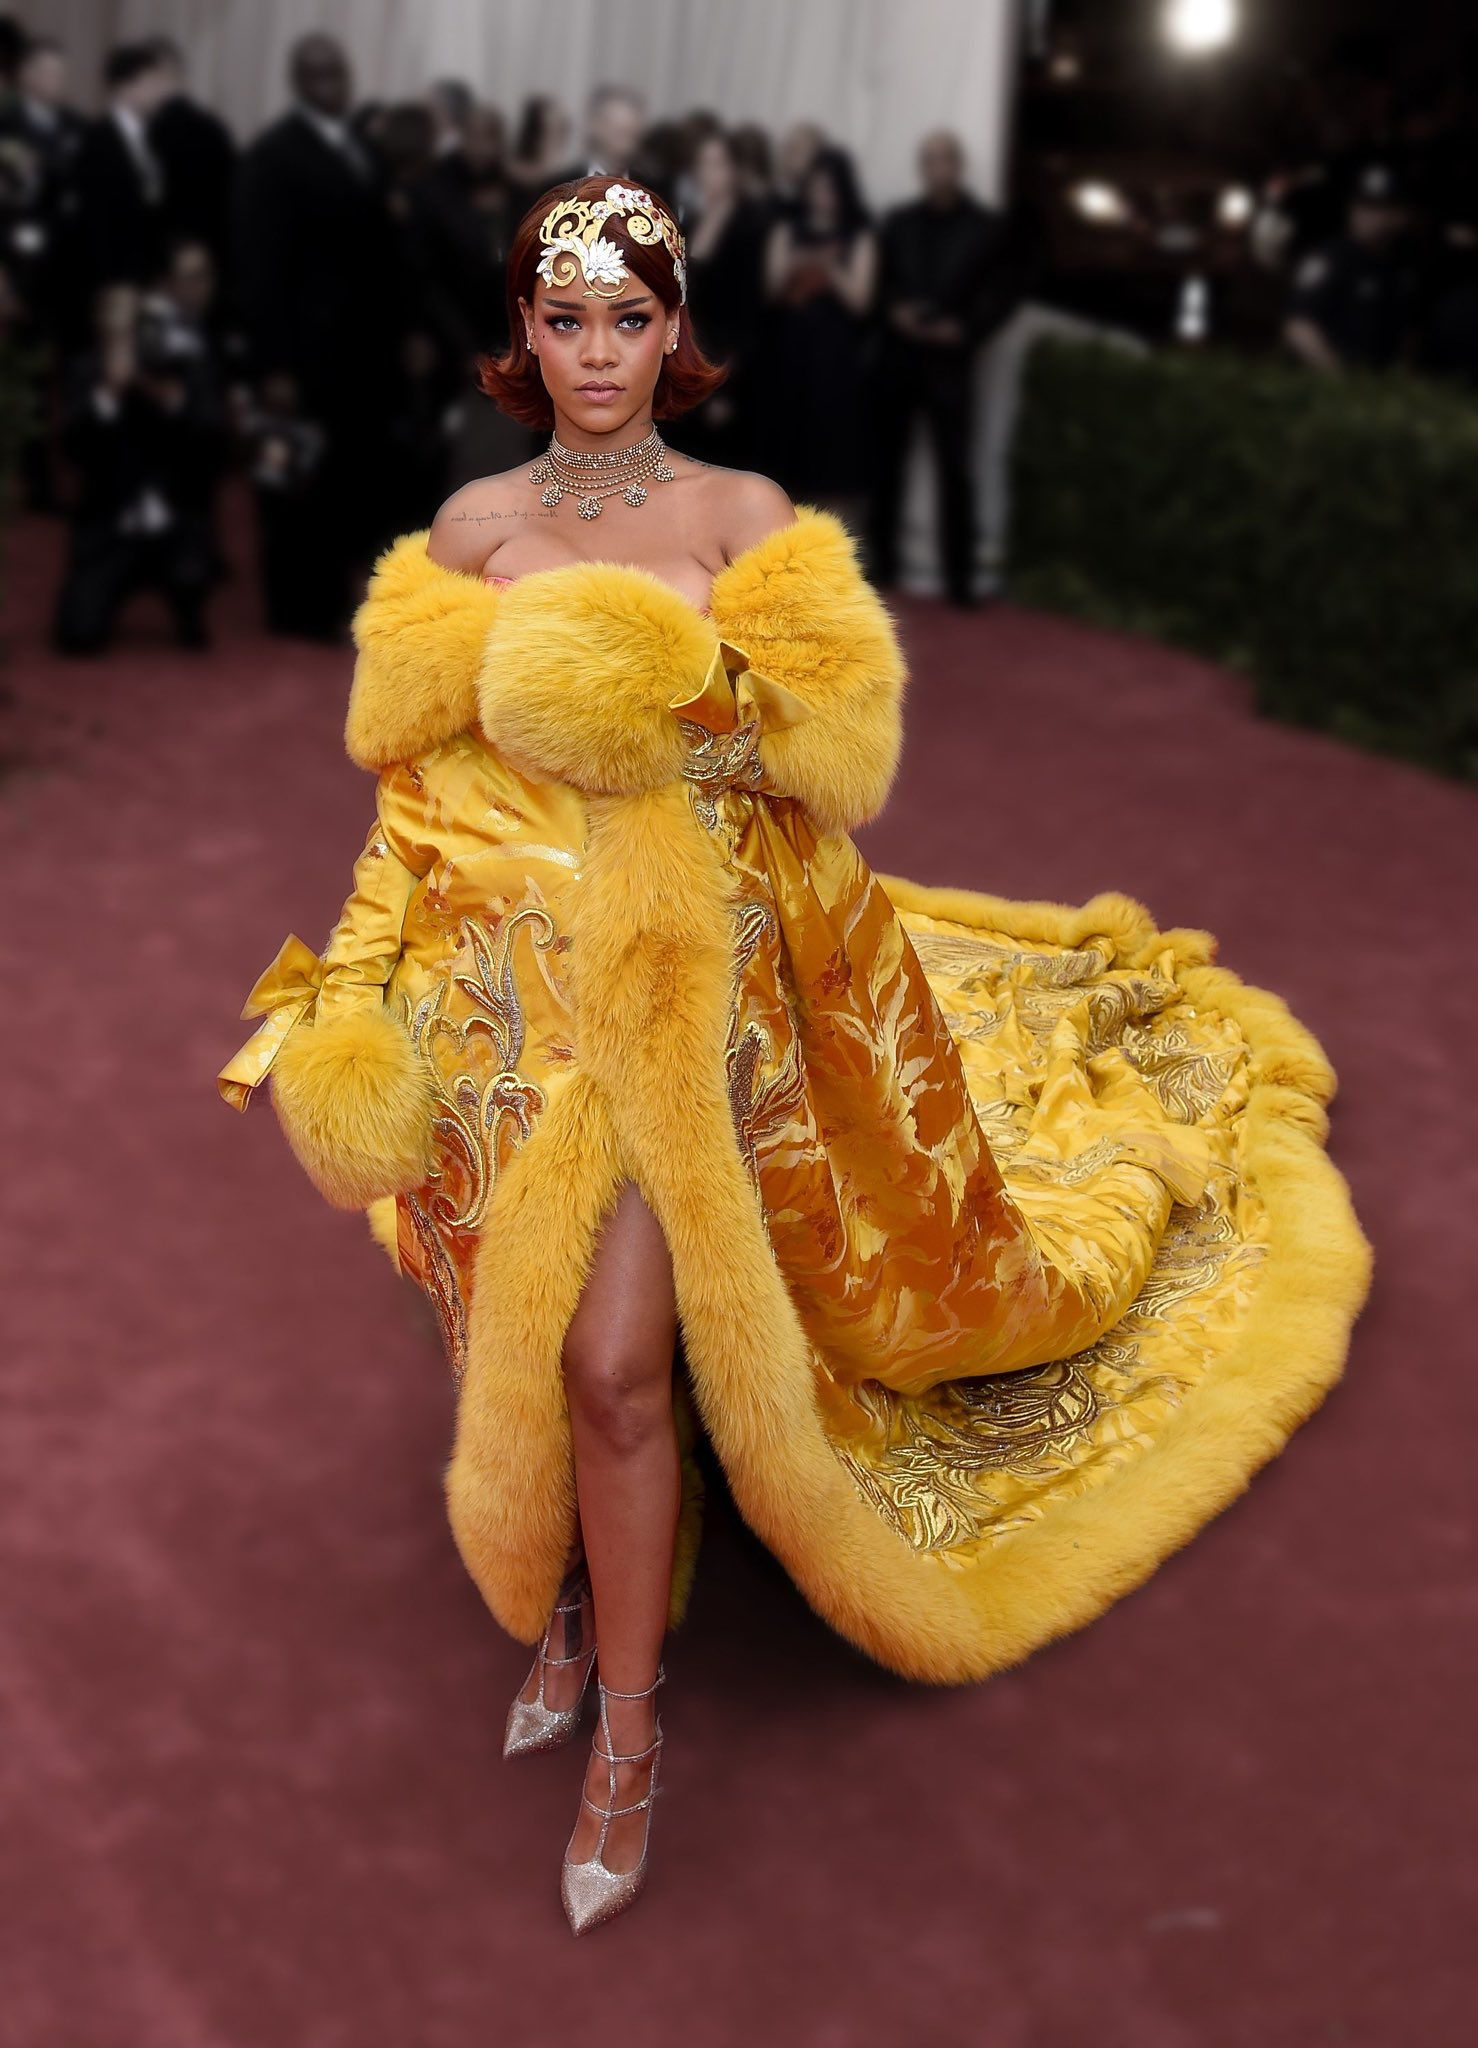 Pin by Uwineza Marie-Rosine on Miscellaneous | Rihanna ...